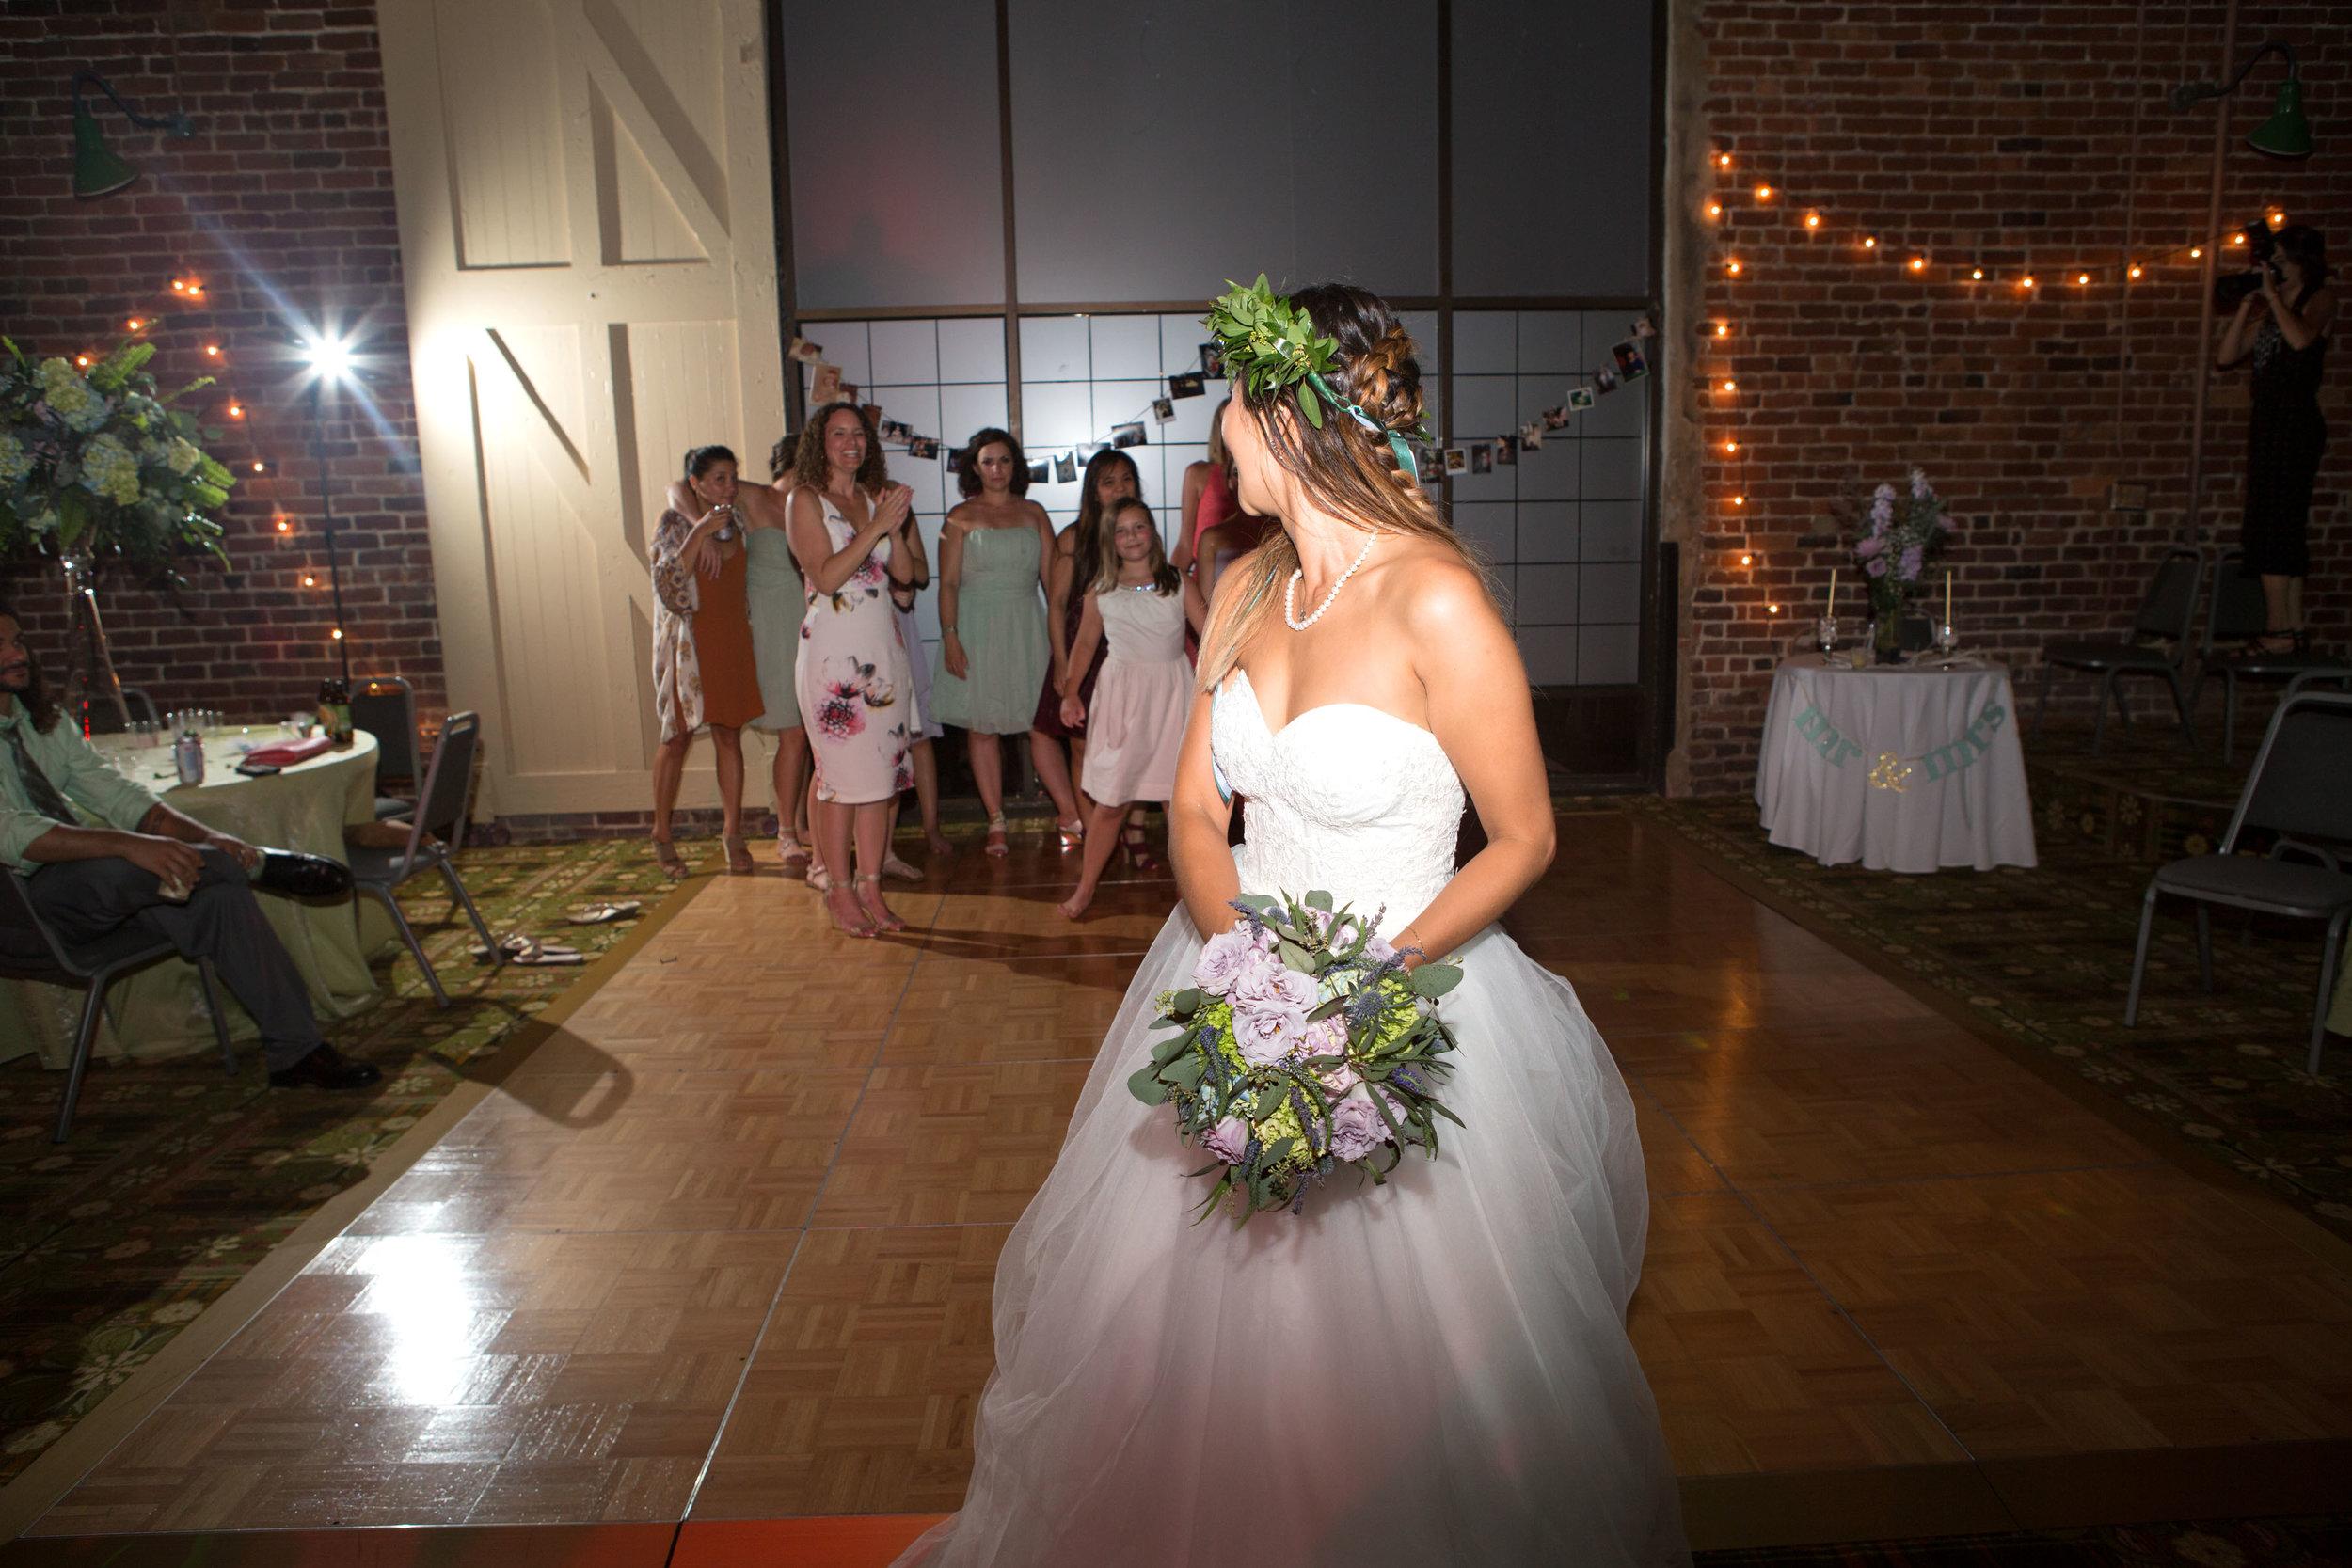 North_Carolina_Wedding_Photographer_Tiffany_Abruzzo_Reception_284.jpg